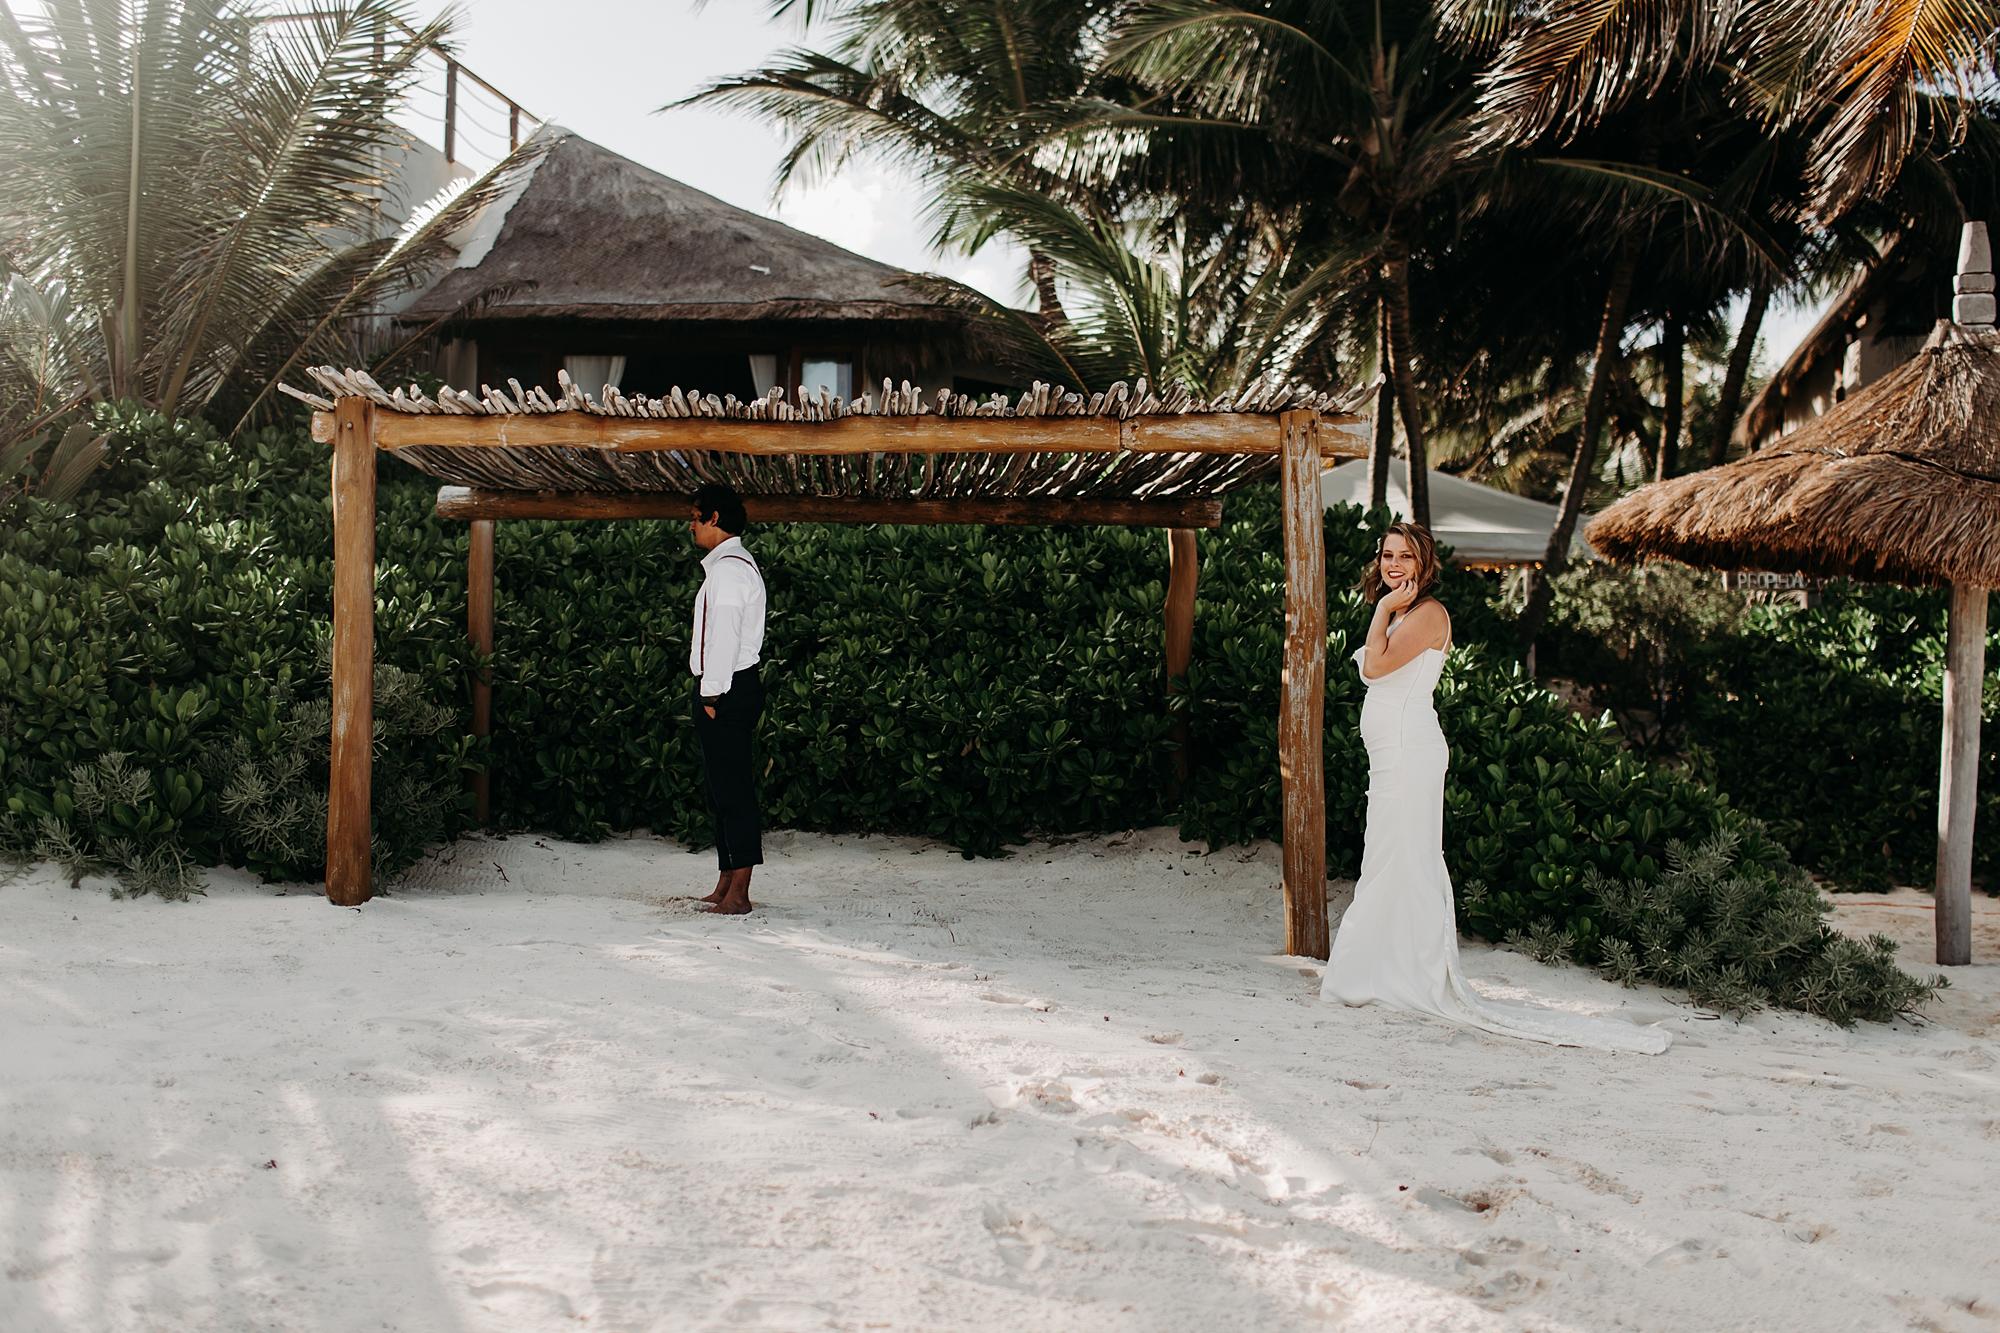 Danielle-San-Antonio-Wedding-Photographer-52_WEB.jpg